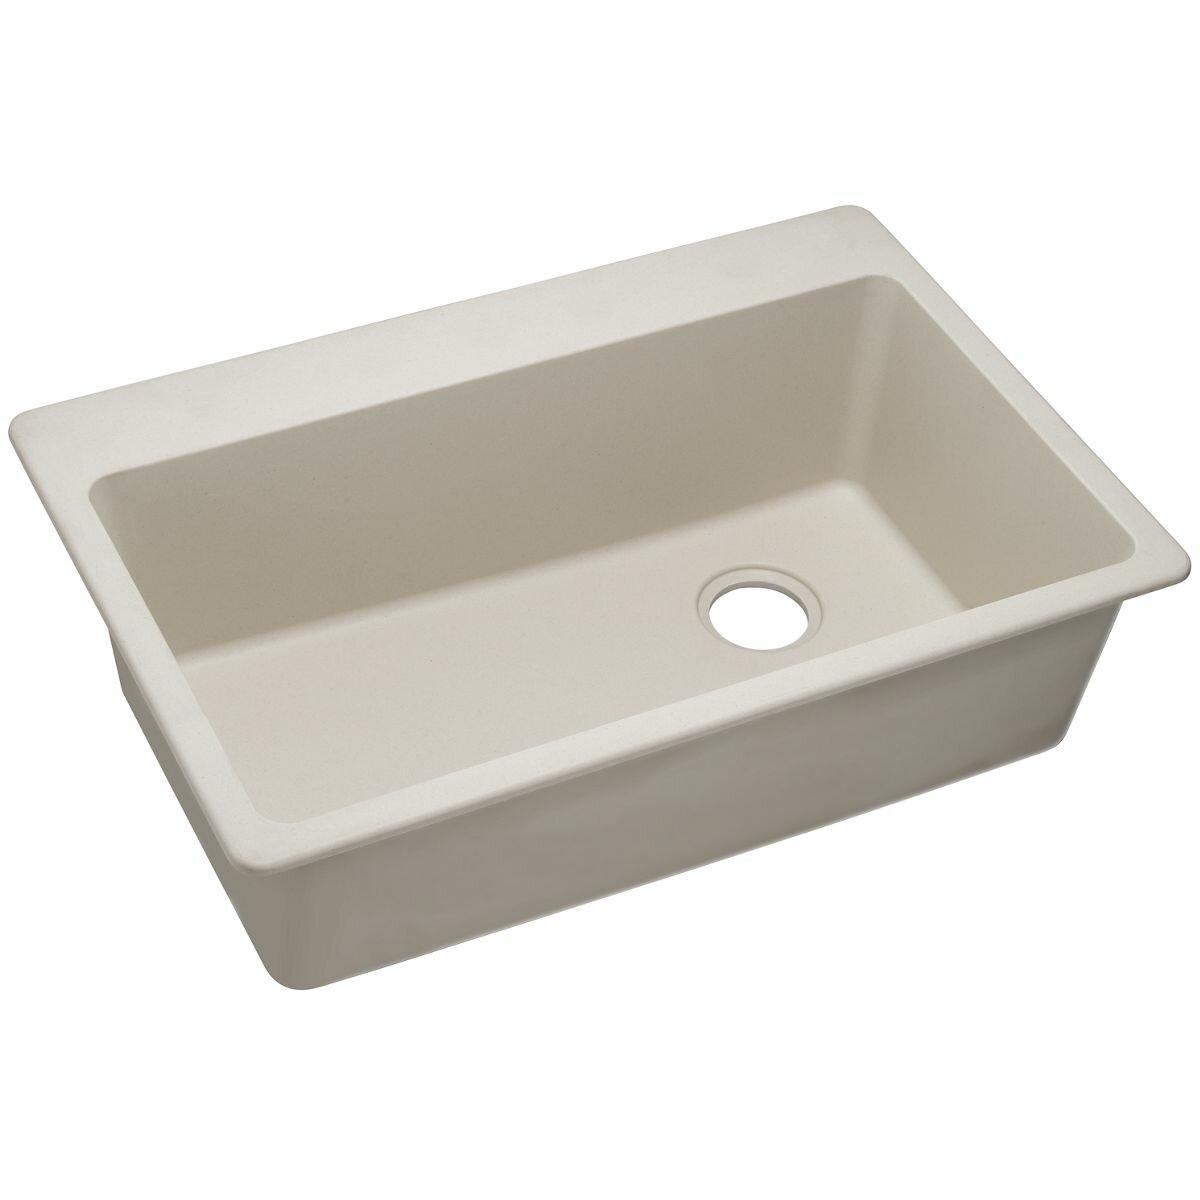 Elkay Quartz Classic 33 X 22 Single Bowl Top Mount Kitchen Sink Reviews Wayfair